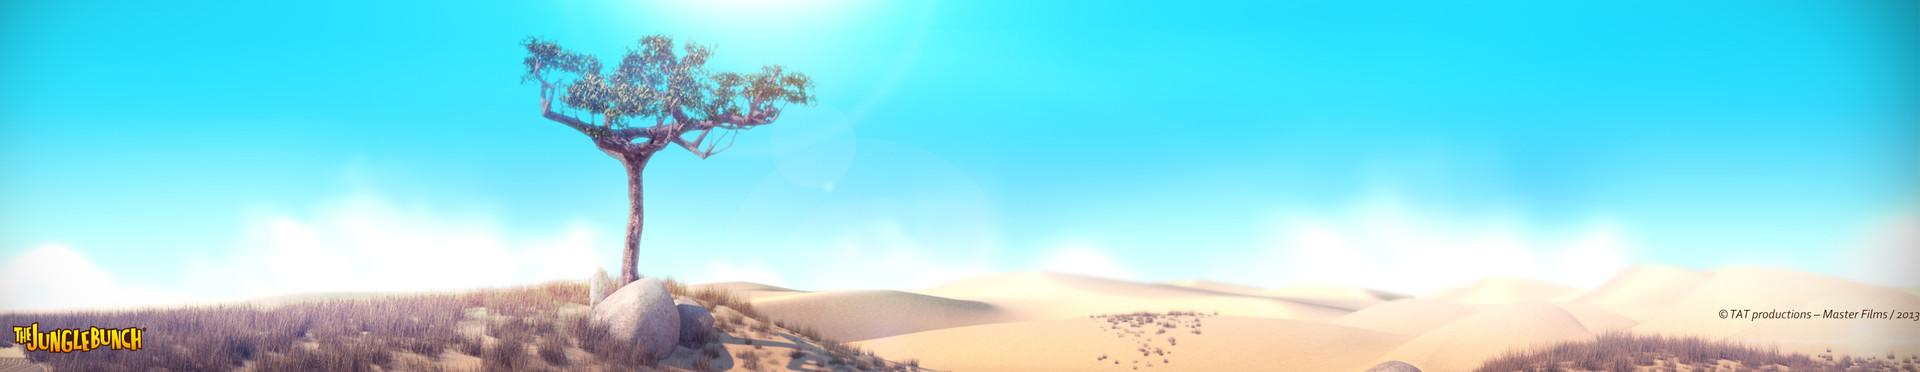 Mickael lelievre savannah desert pano 01